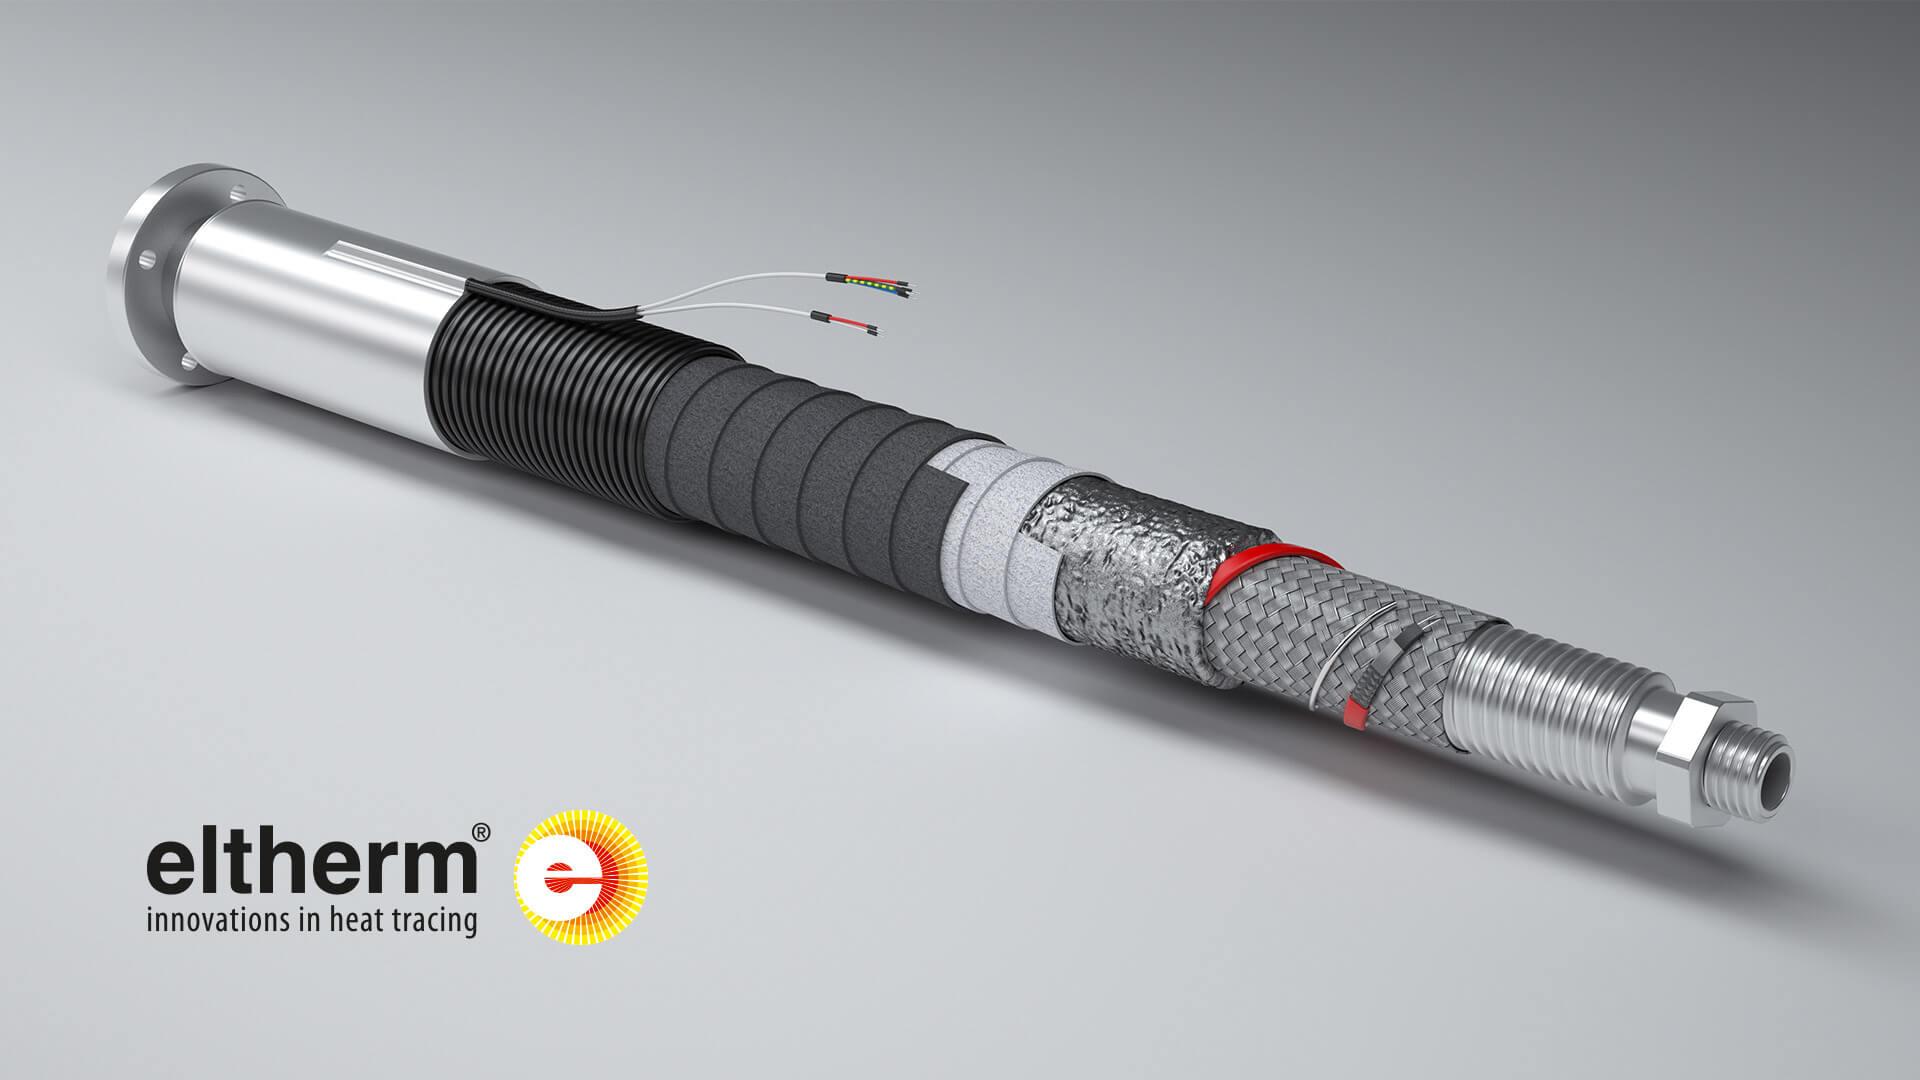 eltherm-3d-visualisierung-kabel-beitragsbild